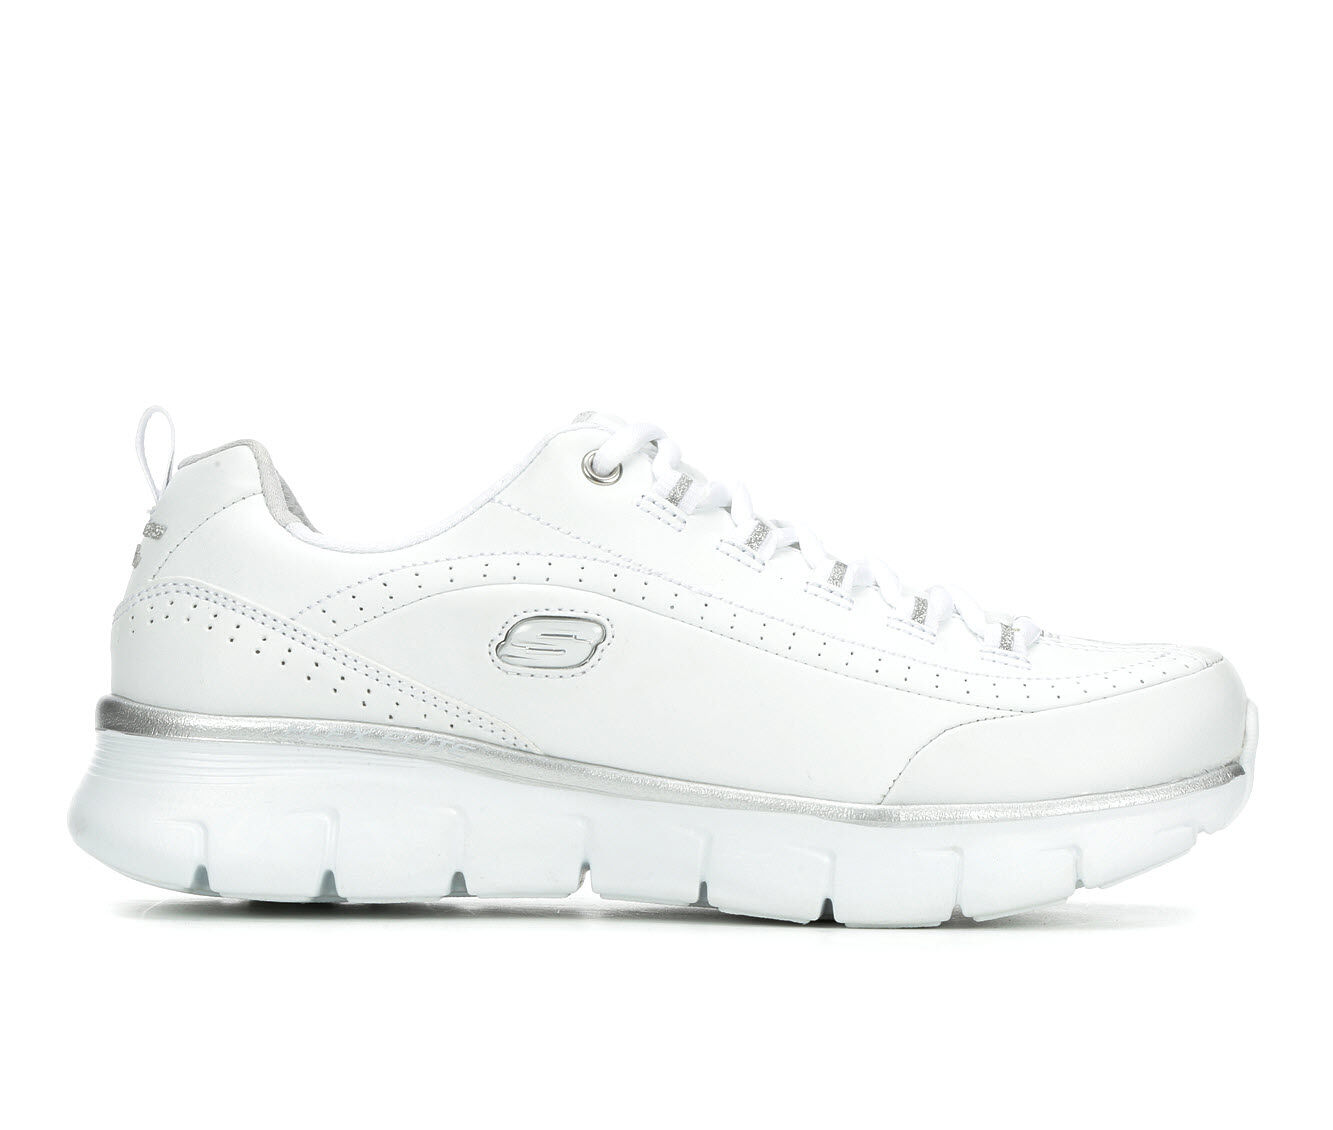 Women's Skechers Synergy 3.0 Sneakers White/Silver